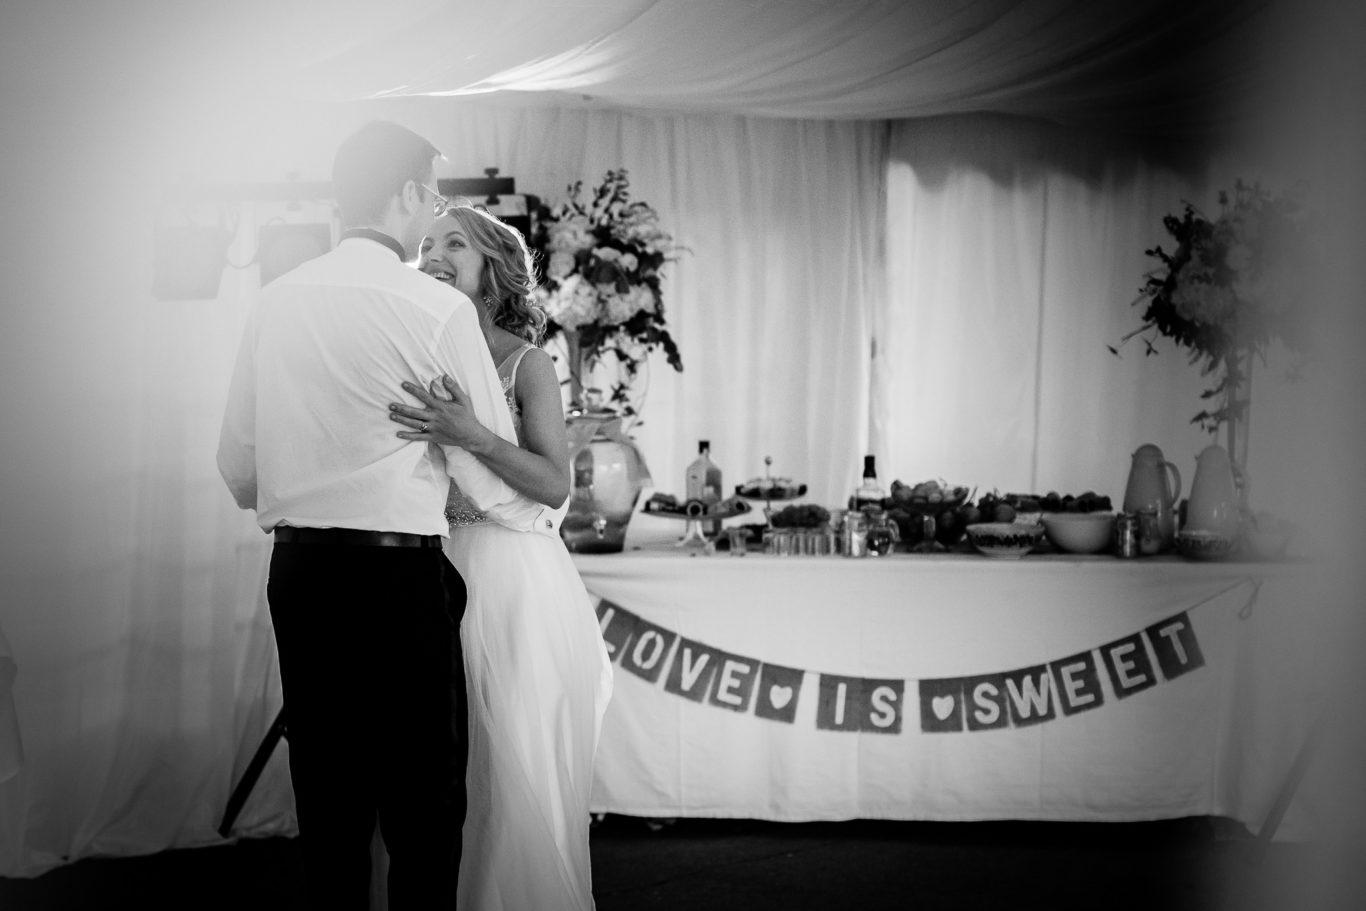 0559-fotografie-nunta-conacul-apafi-ana-simion-fotograf-ciprian-dumitrescu-cd2_1002